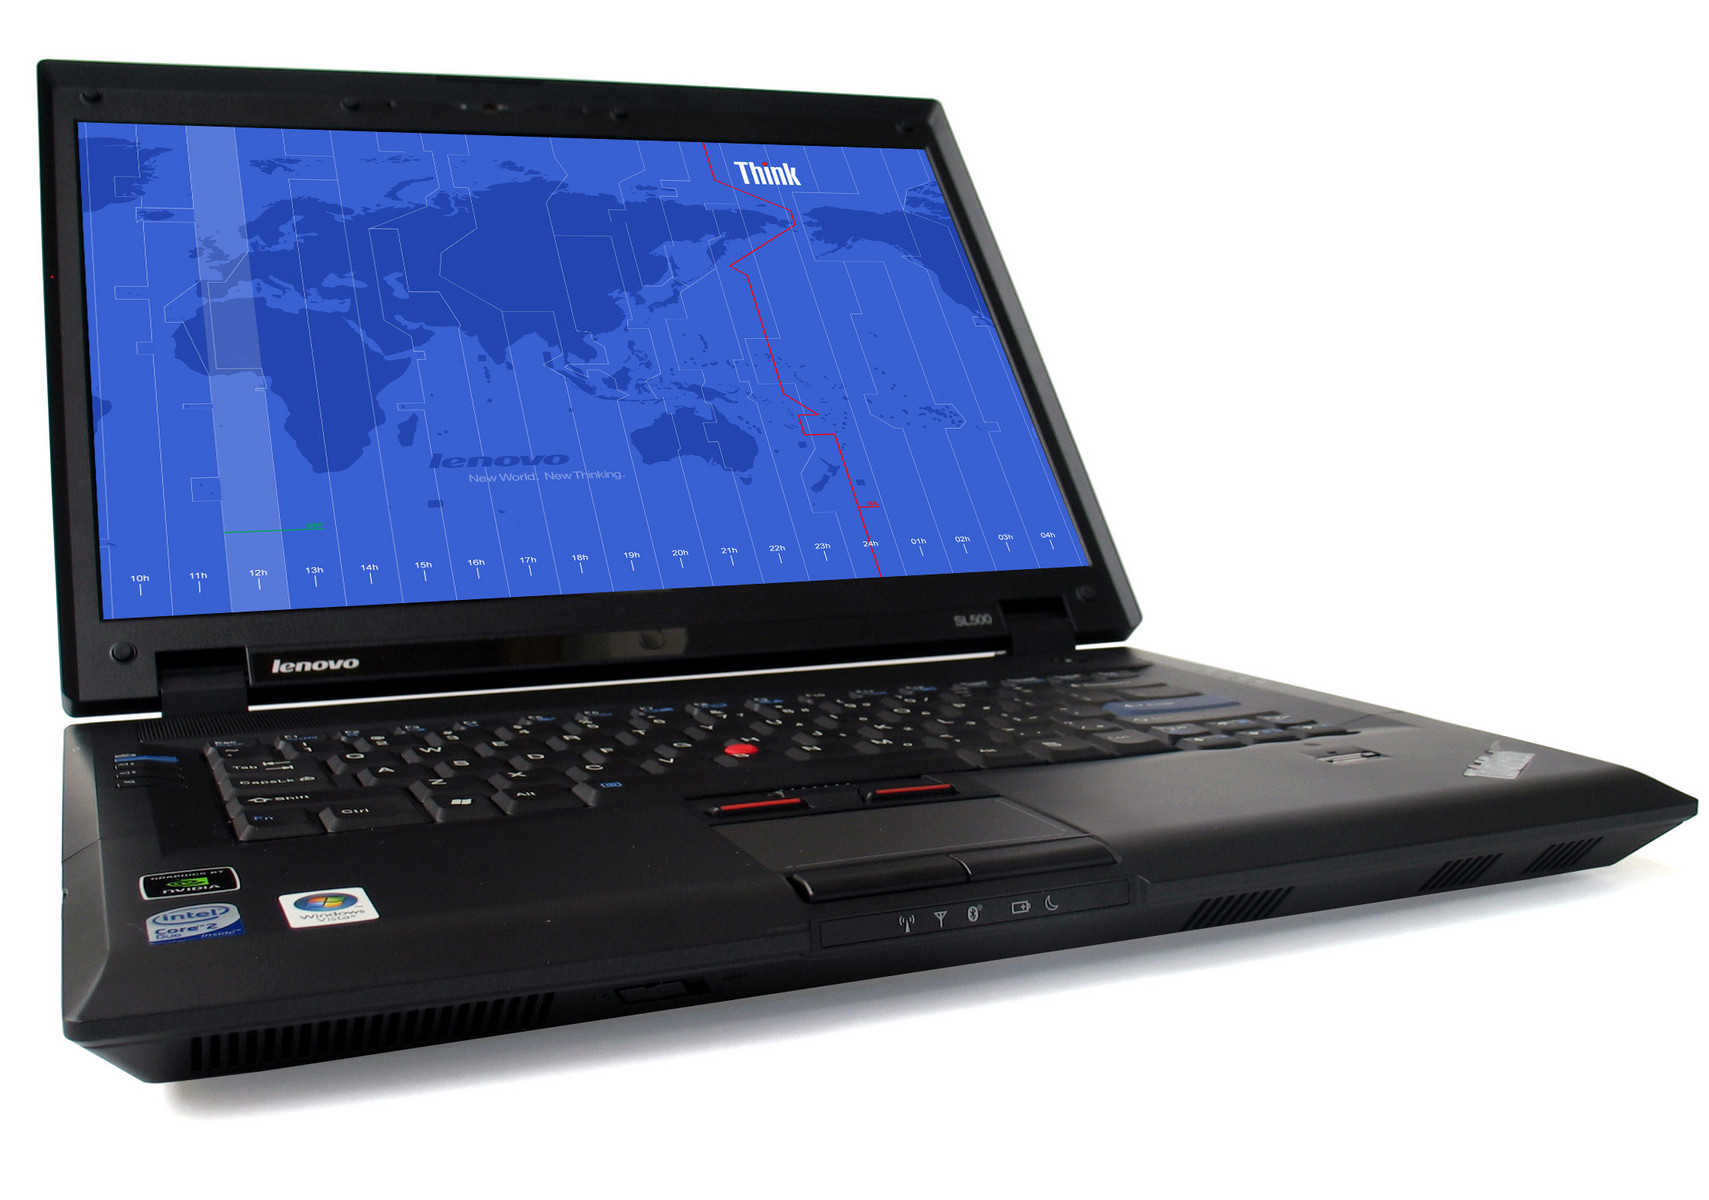 Lenovo Thinkpad SL500 - Notebookcheck.net External Reviews